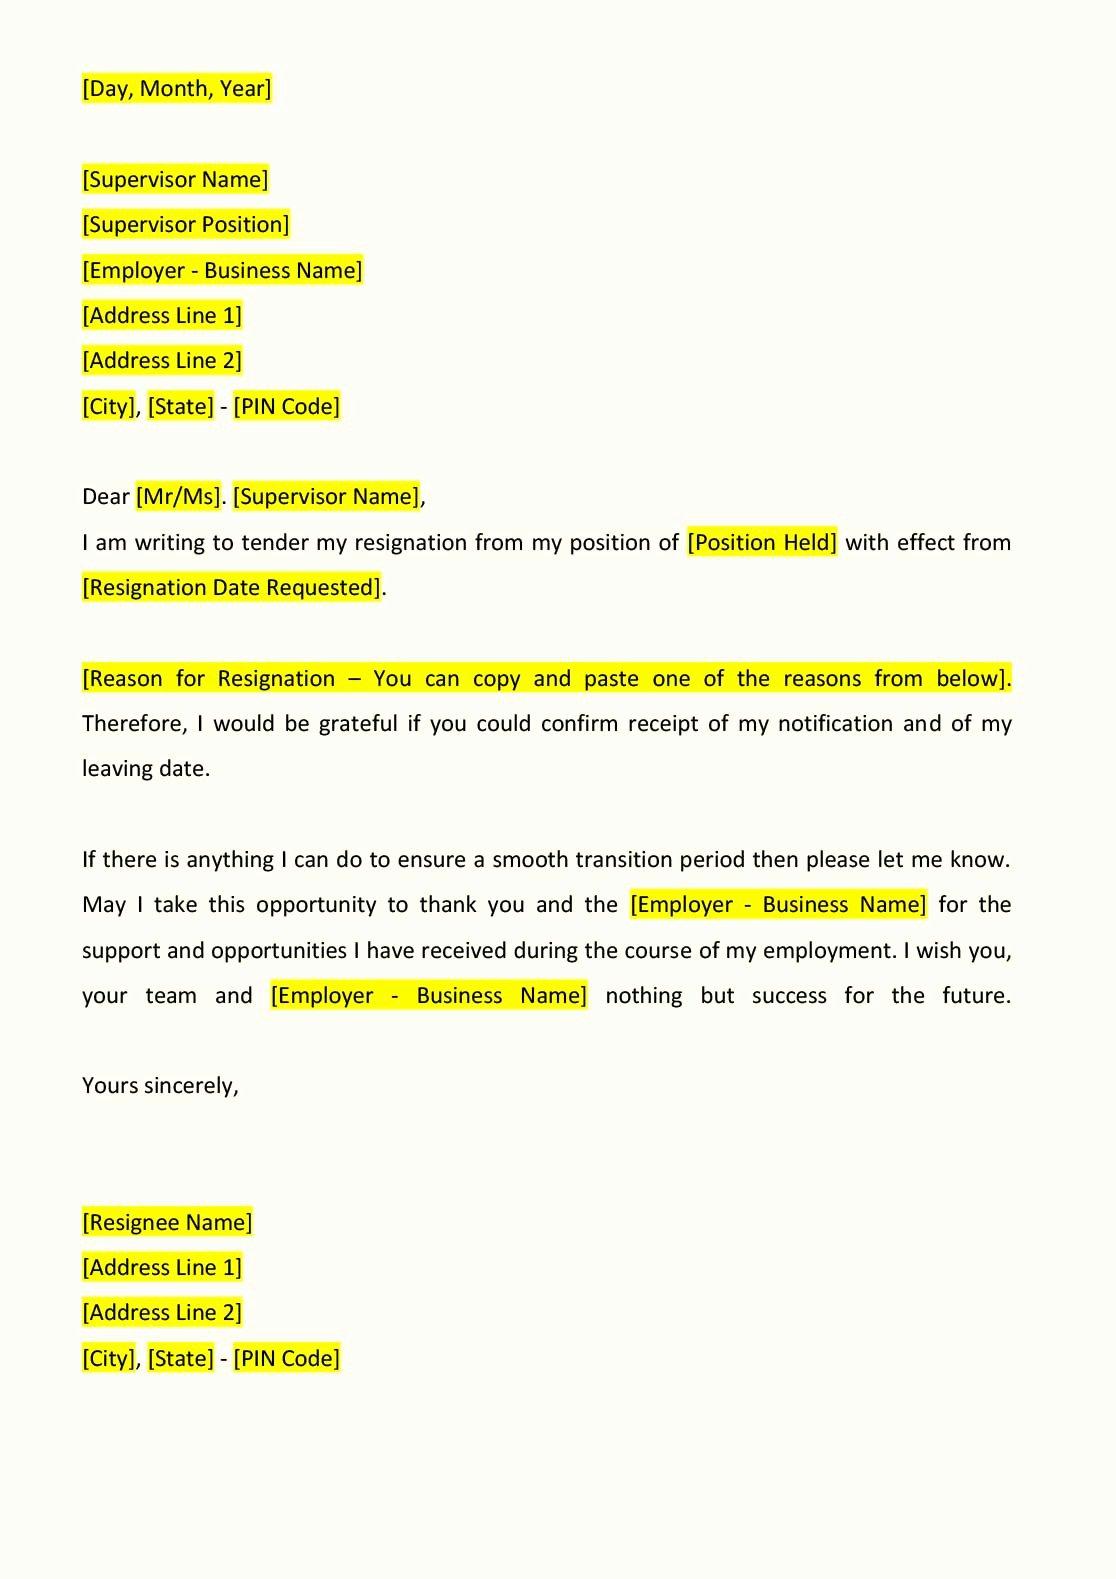 Form Letter Of Resignation Luxury Resignation Letter format Indiafilings Document Center